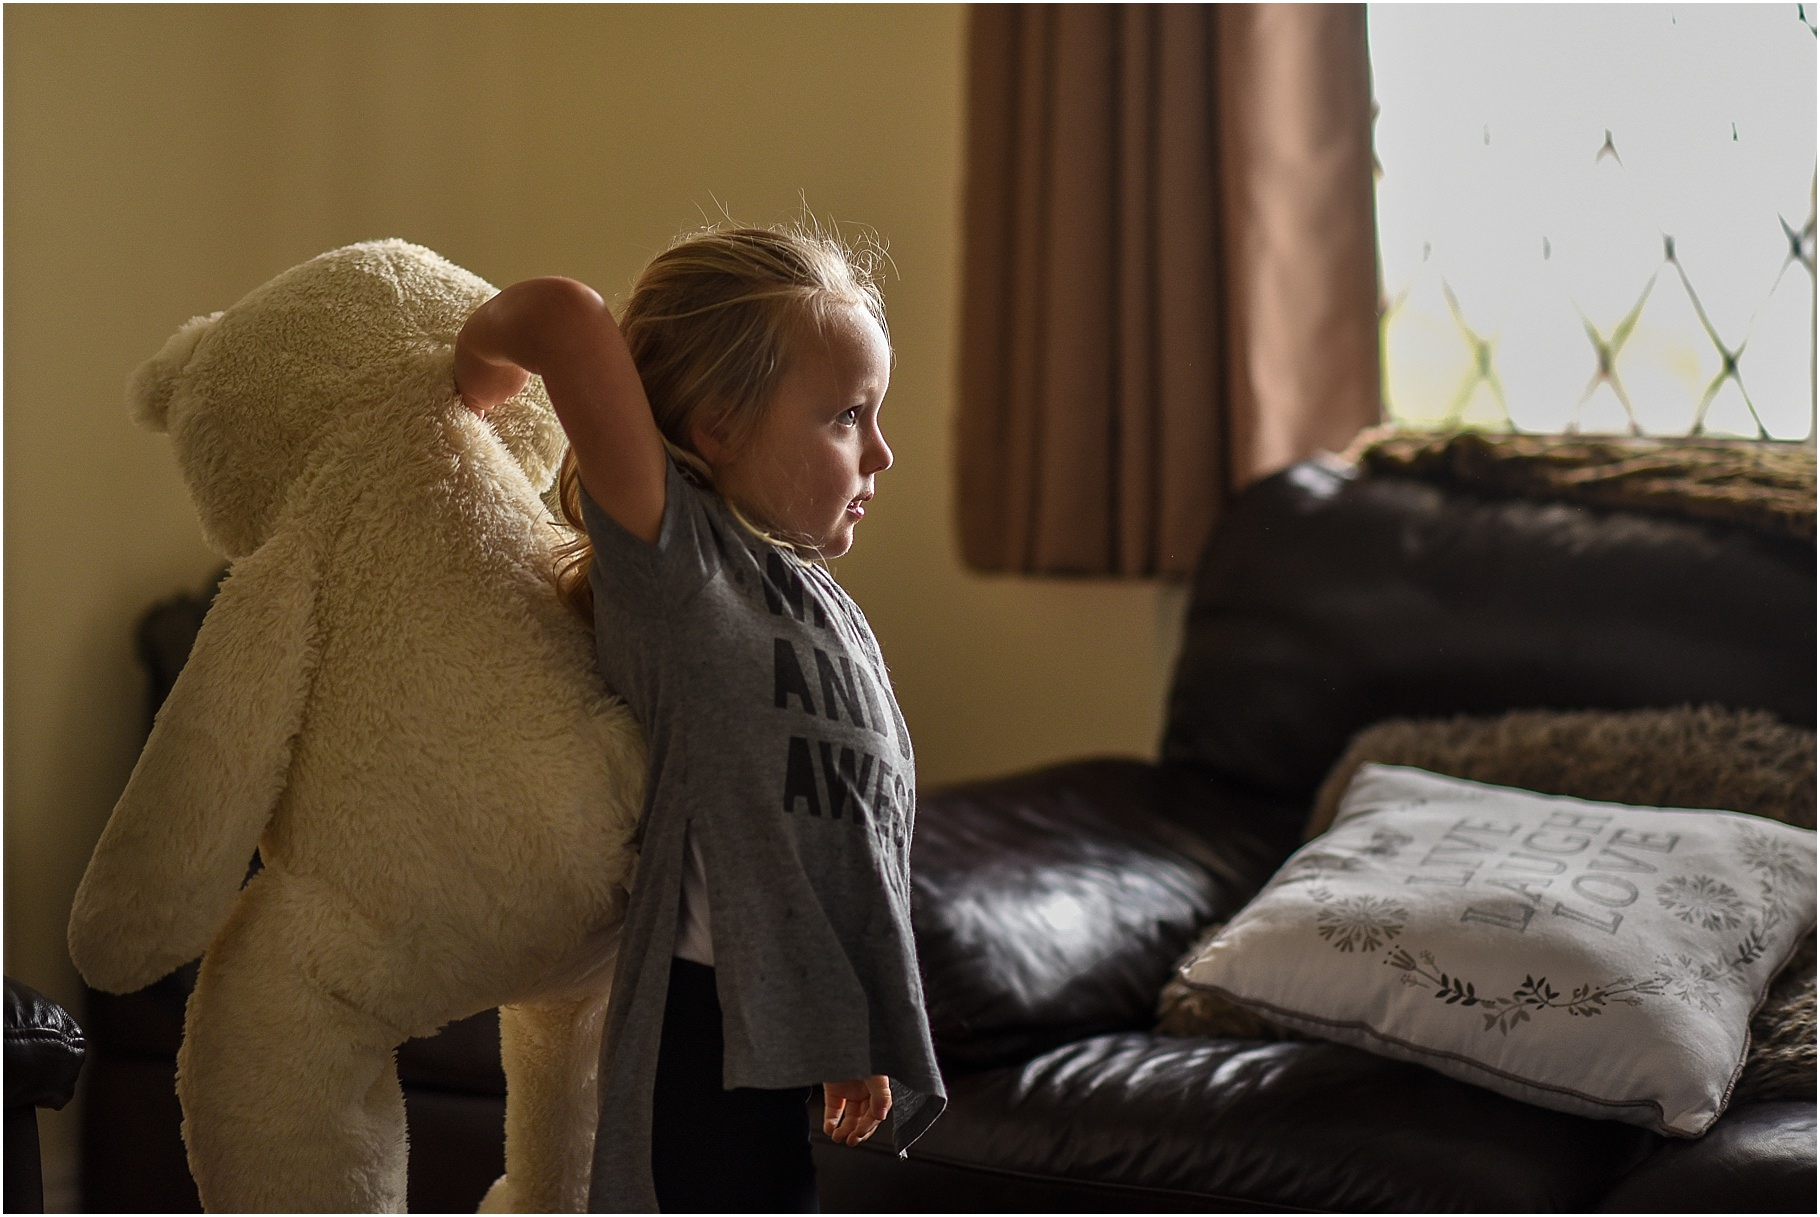 lancashire-family-portraits-documentary-newborn-12.jpg